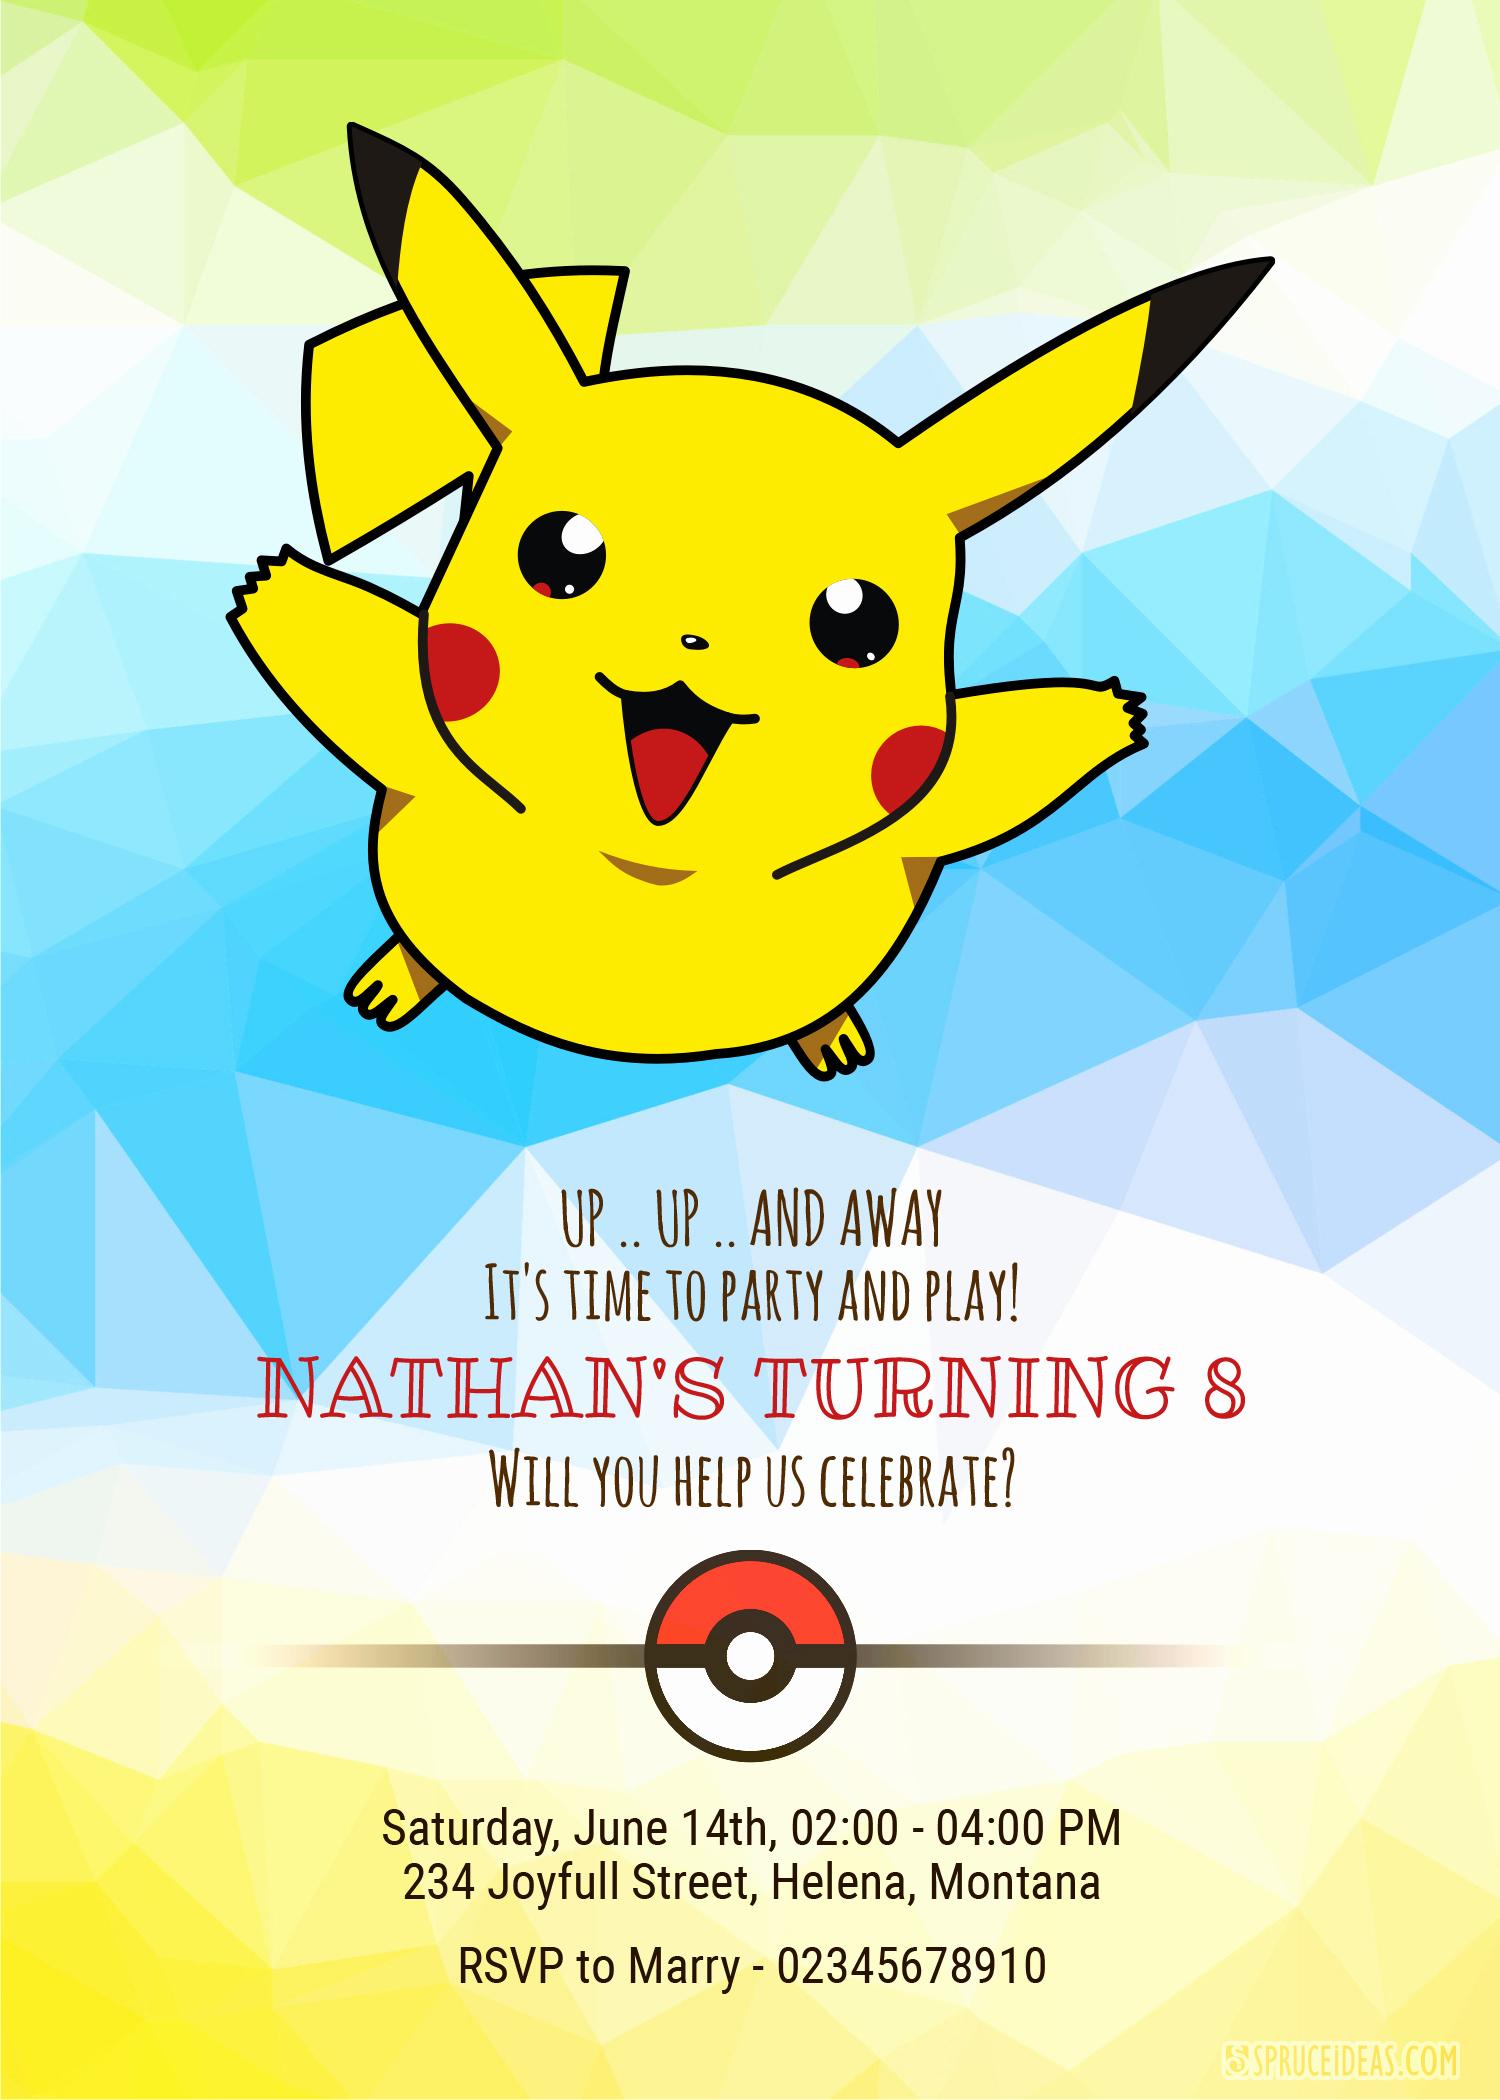 Pokemon Birthday Invitation Templates Free Best Of Personalized Pikachu Pokemon Birthday Invitation Template